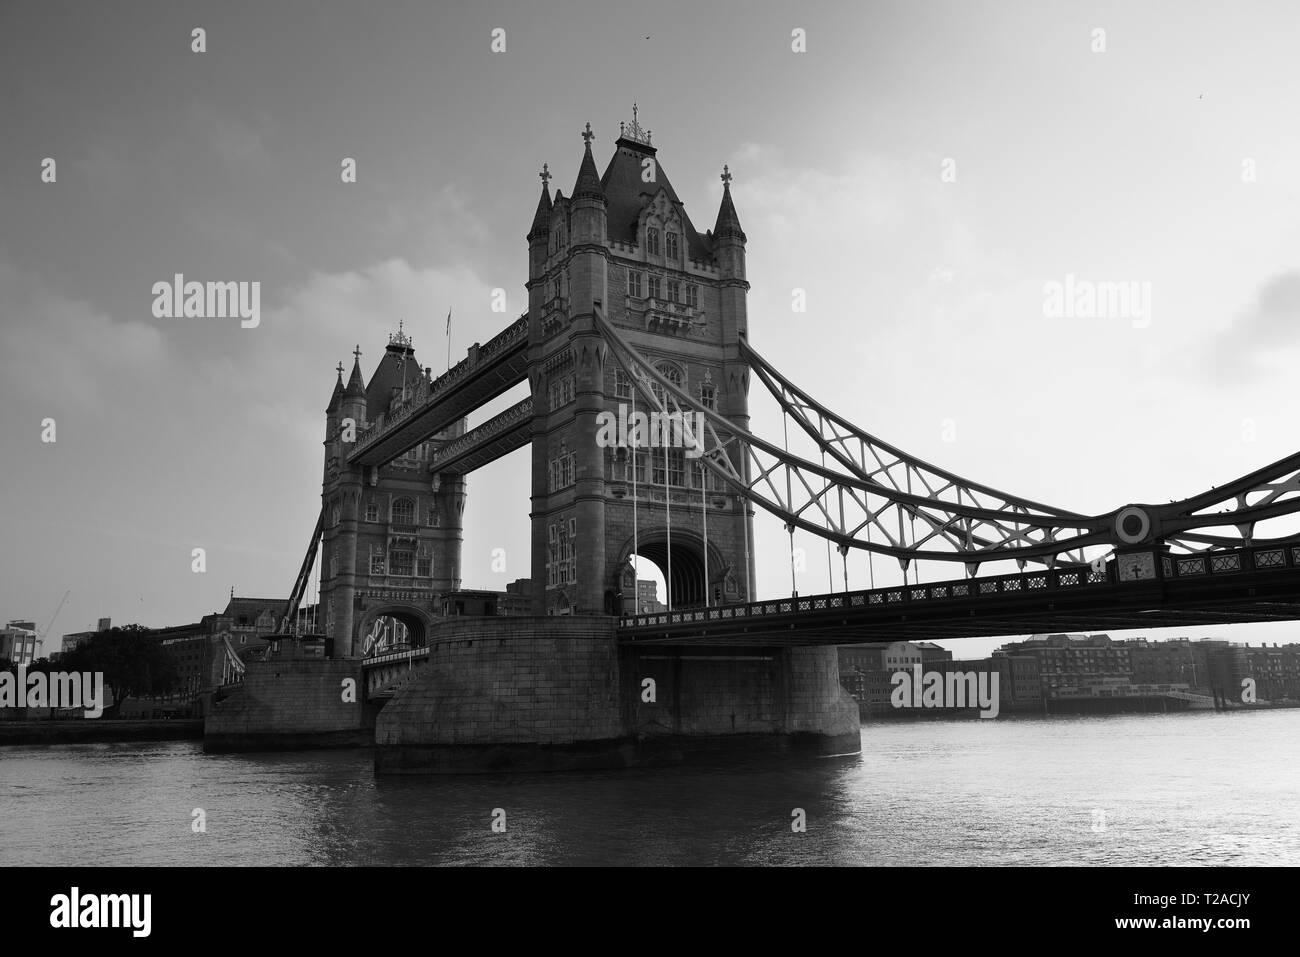 Tower Bridge London as the city landmark.. - Stock Image